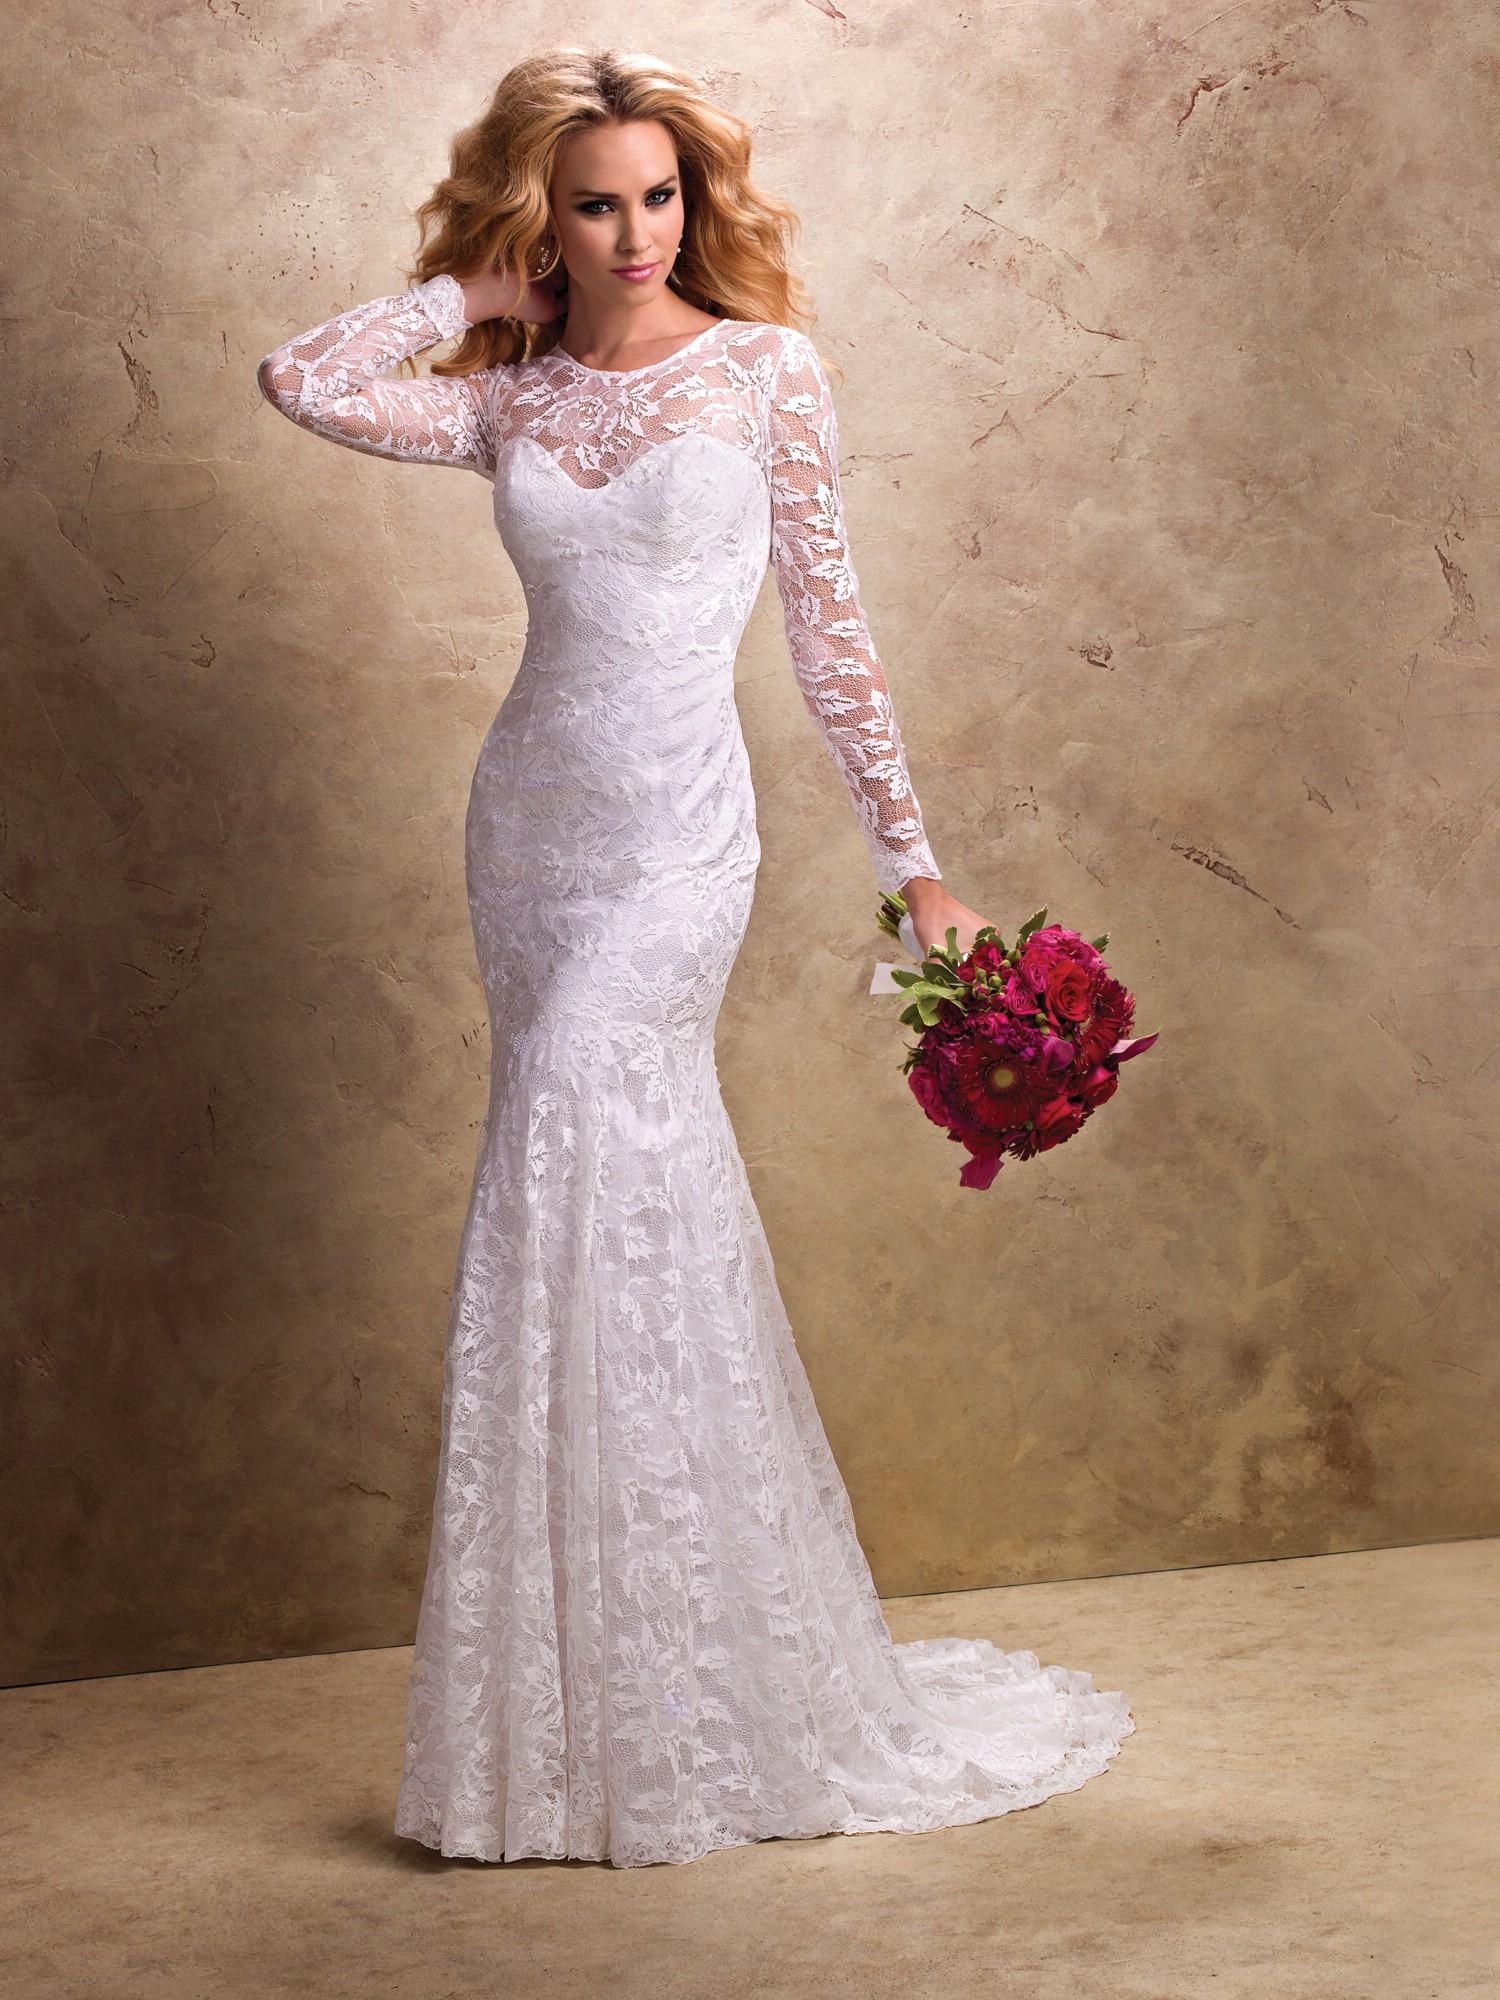 top ten wedding dresses wedding dress styles Runway Fashion Top 10 Wedding Dress Trends The best wedding dress trends See our top 10 wedding dress trends on TheKnot com